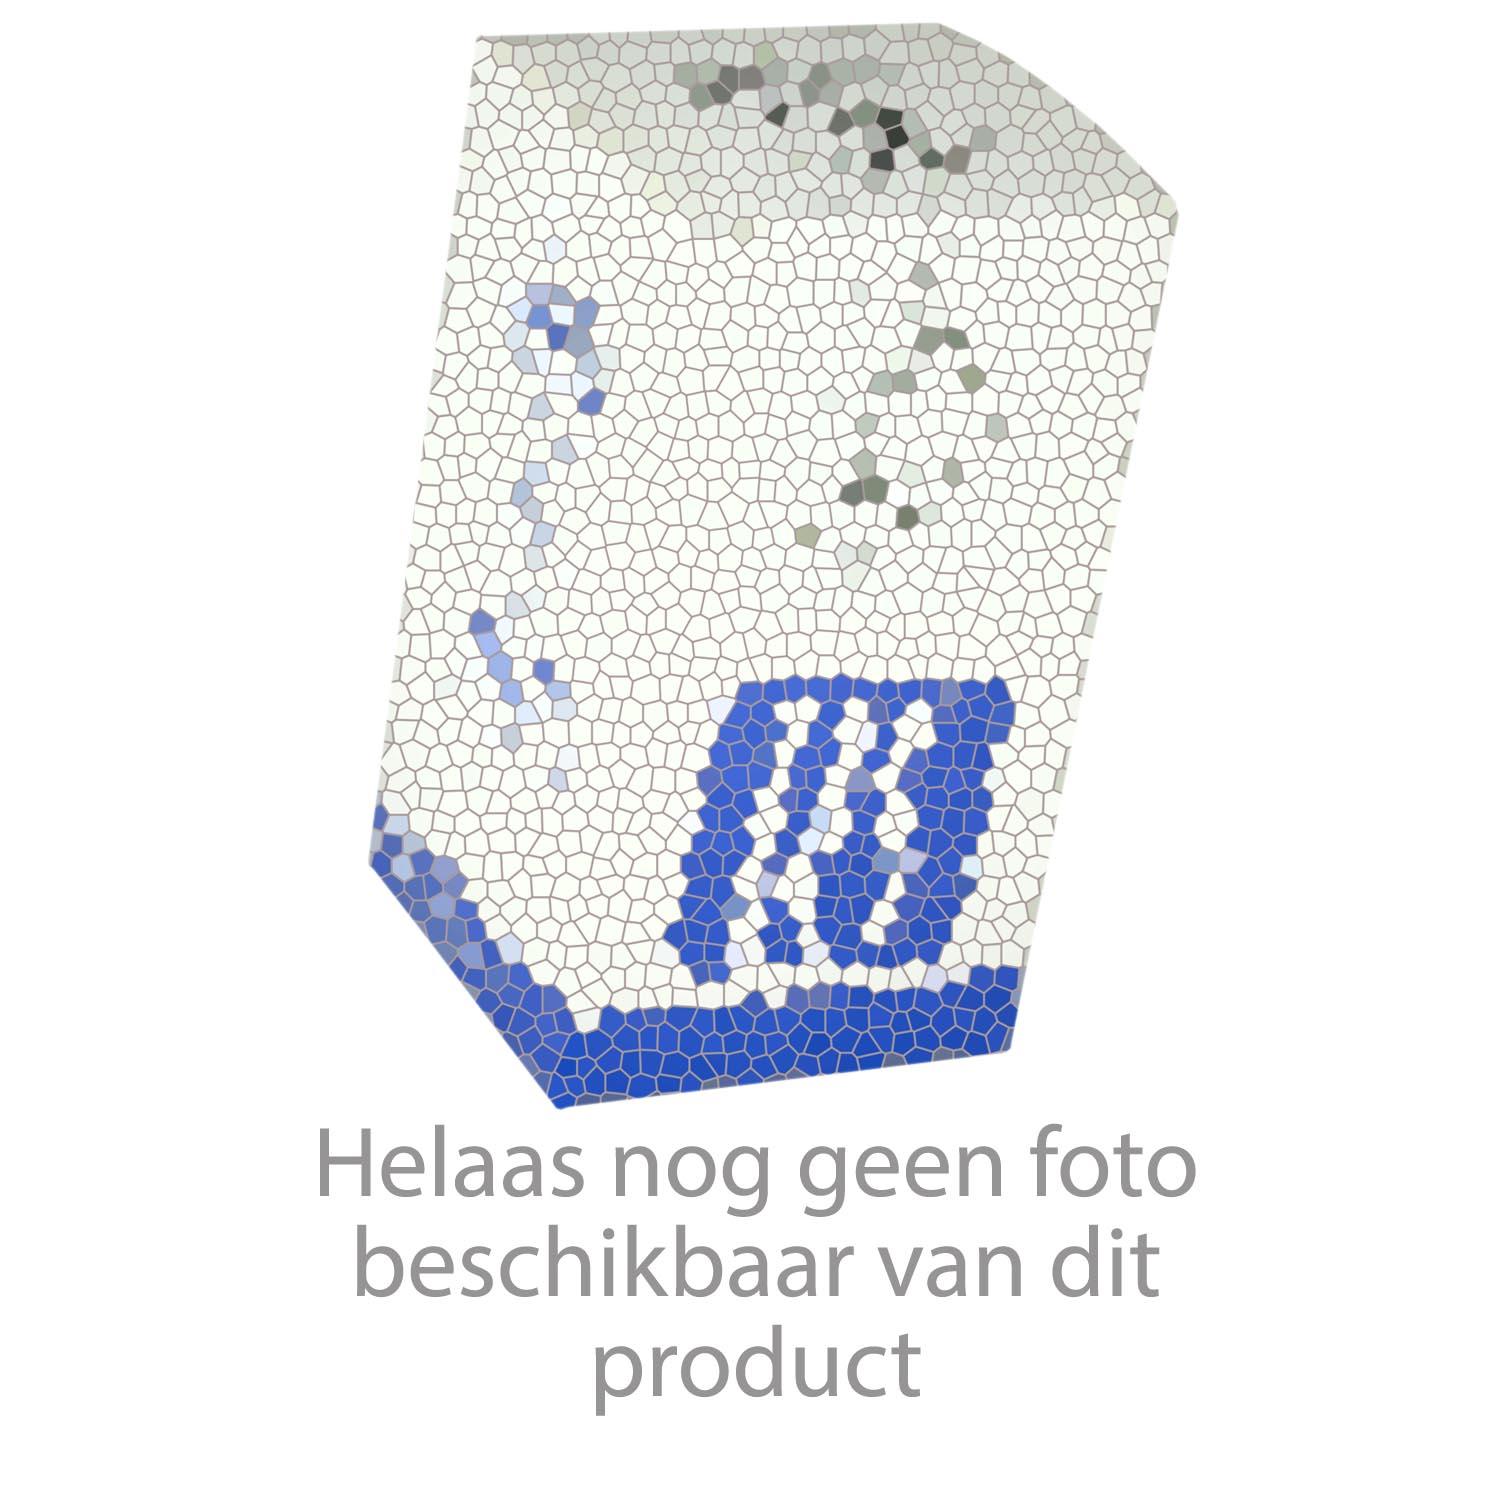 HansGrohe Keukenmengkranen Allegra Sportive / Allegra Talis'E productiejaar > 05/01 32810000 onderdelen